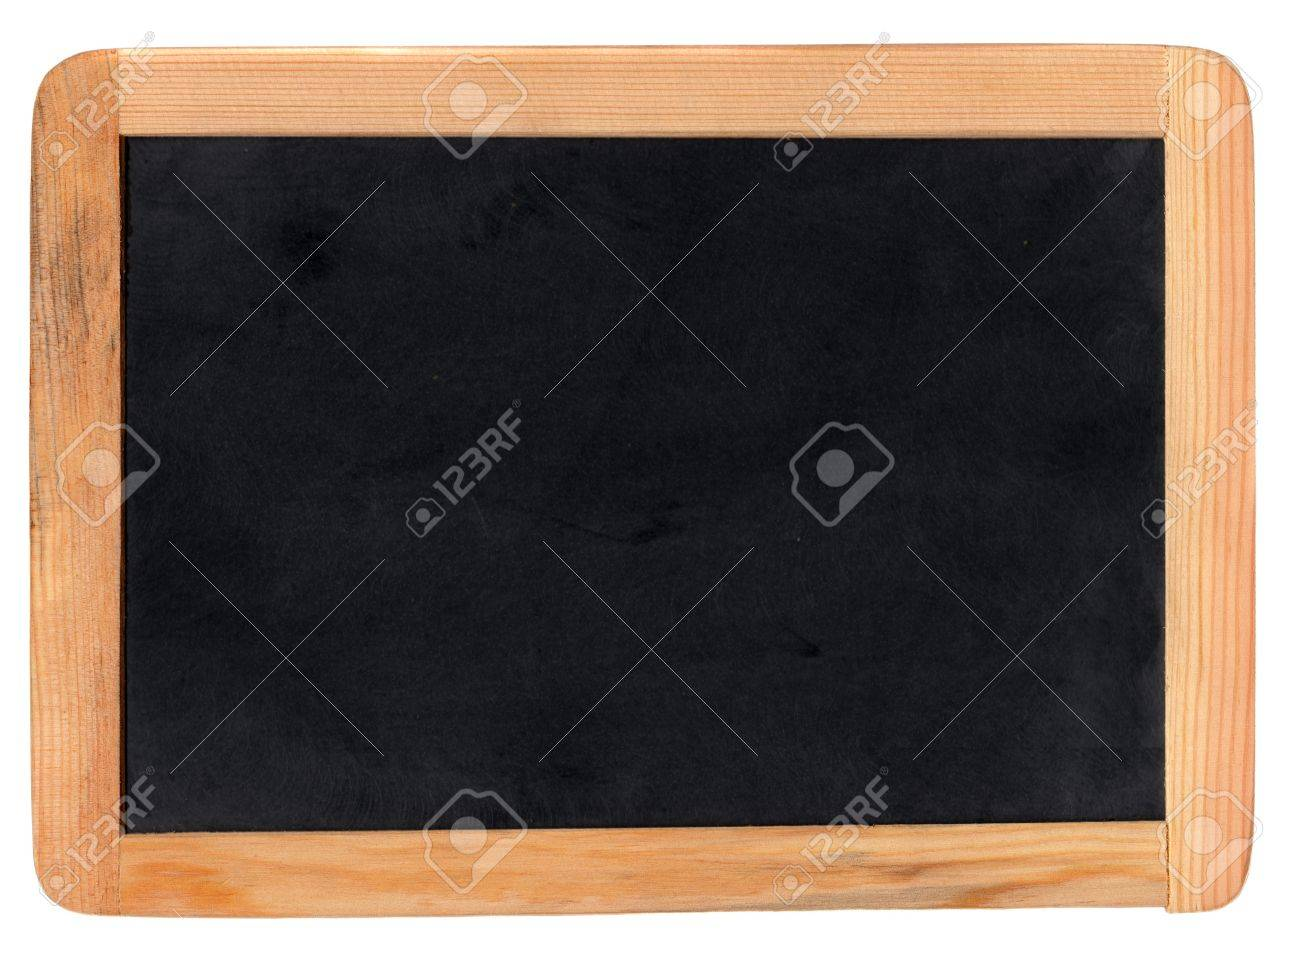 Small school wooden blank blackboard isolated on white background Standard-Bild - 3995869